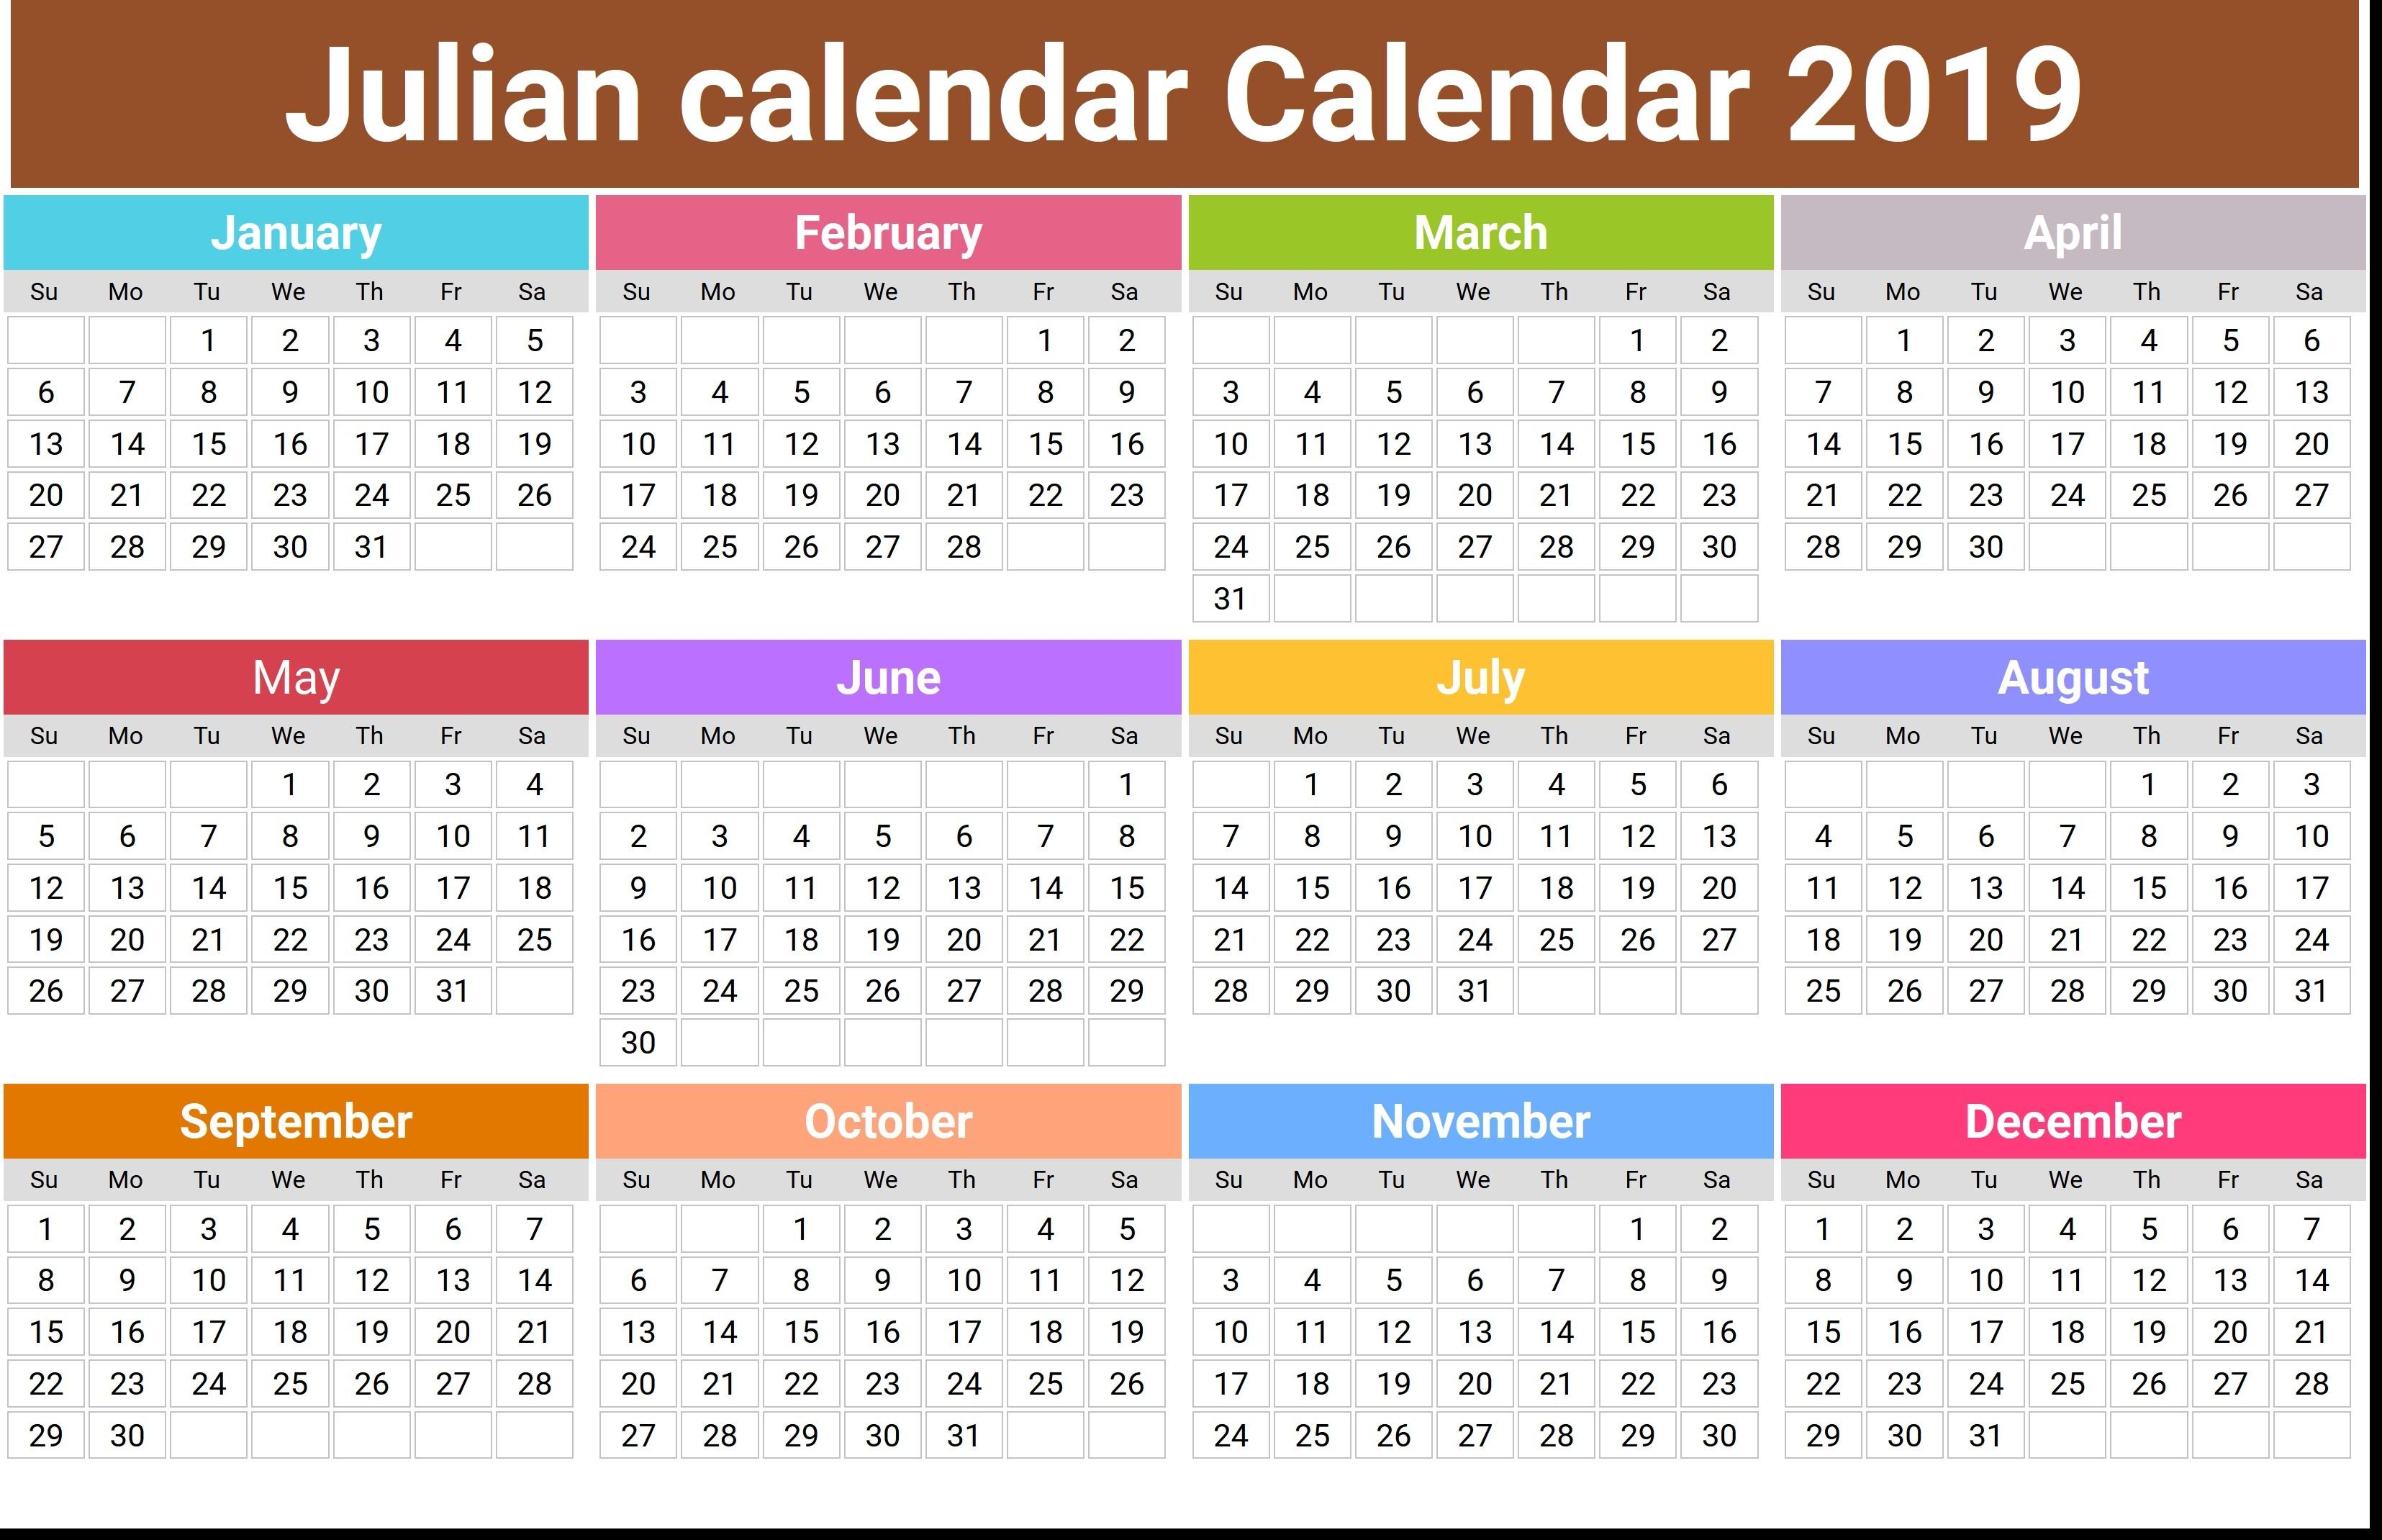 2019 Julian Calendar Printable   Isacl